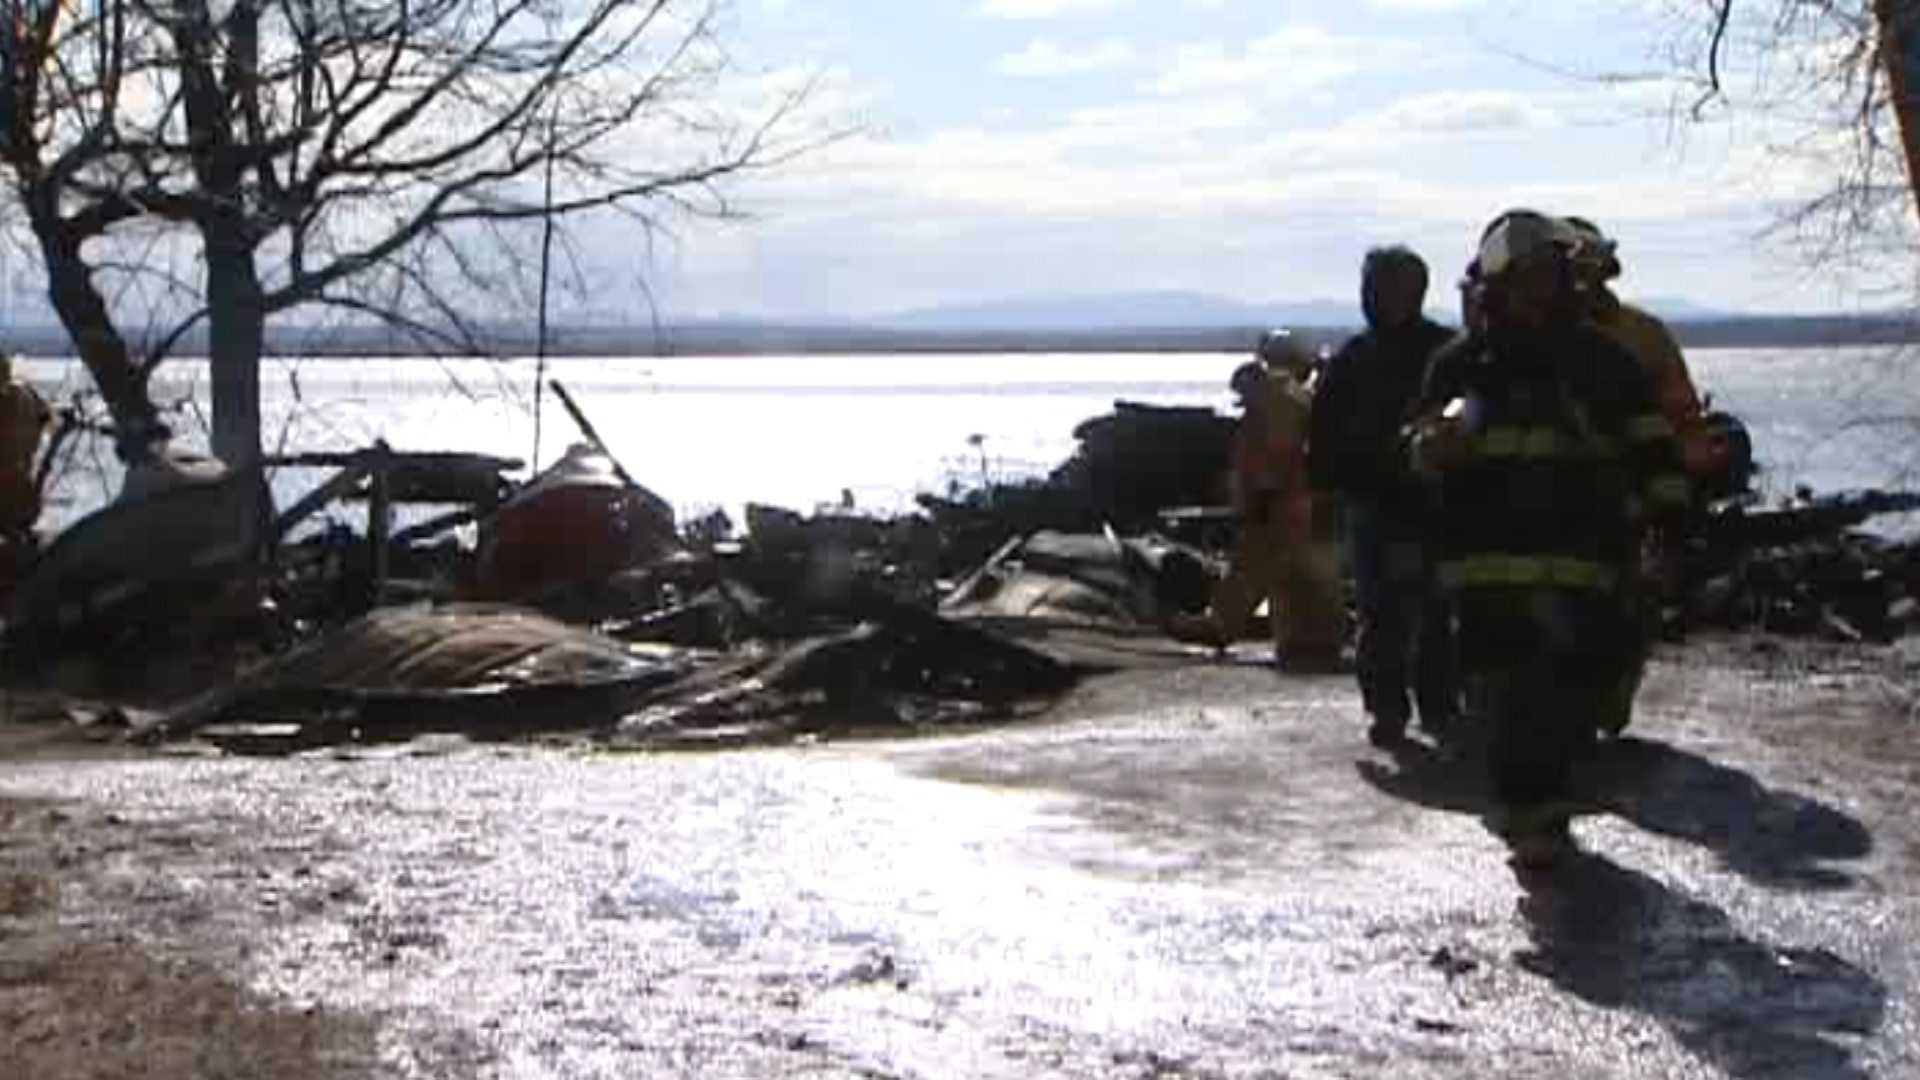 04-03-13 Fire destroys Alburgh home - img